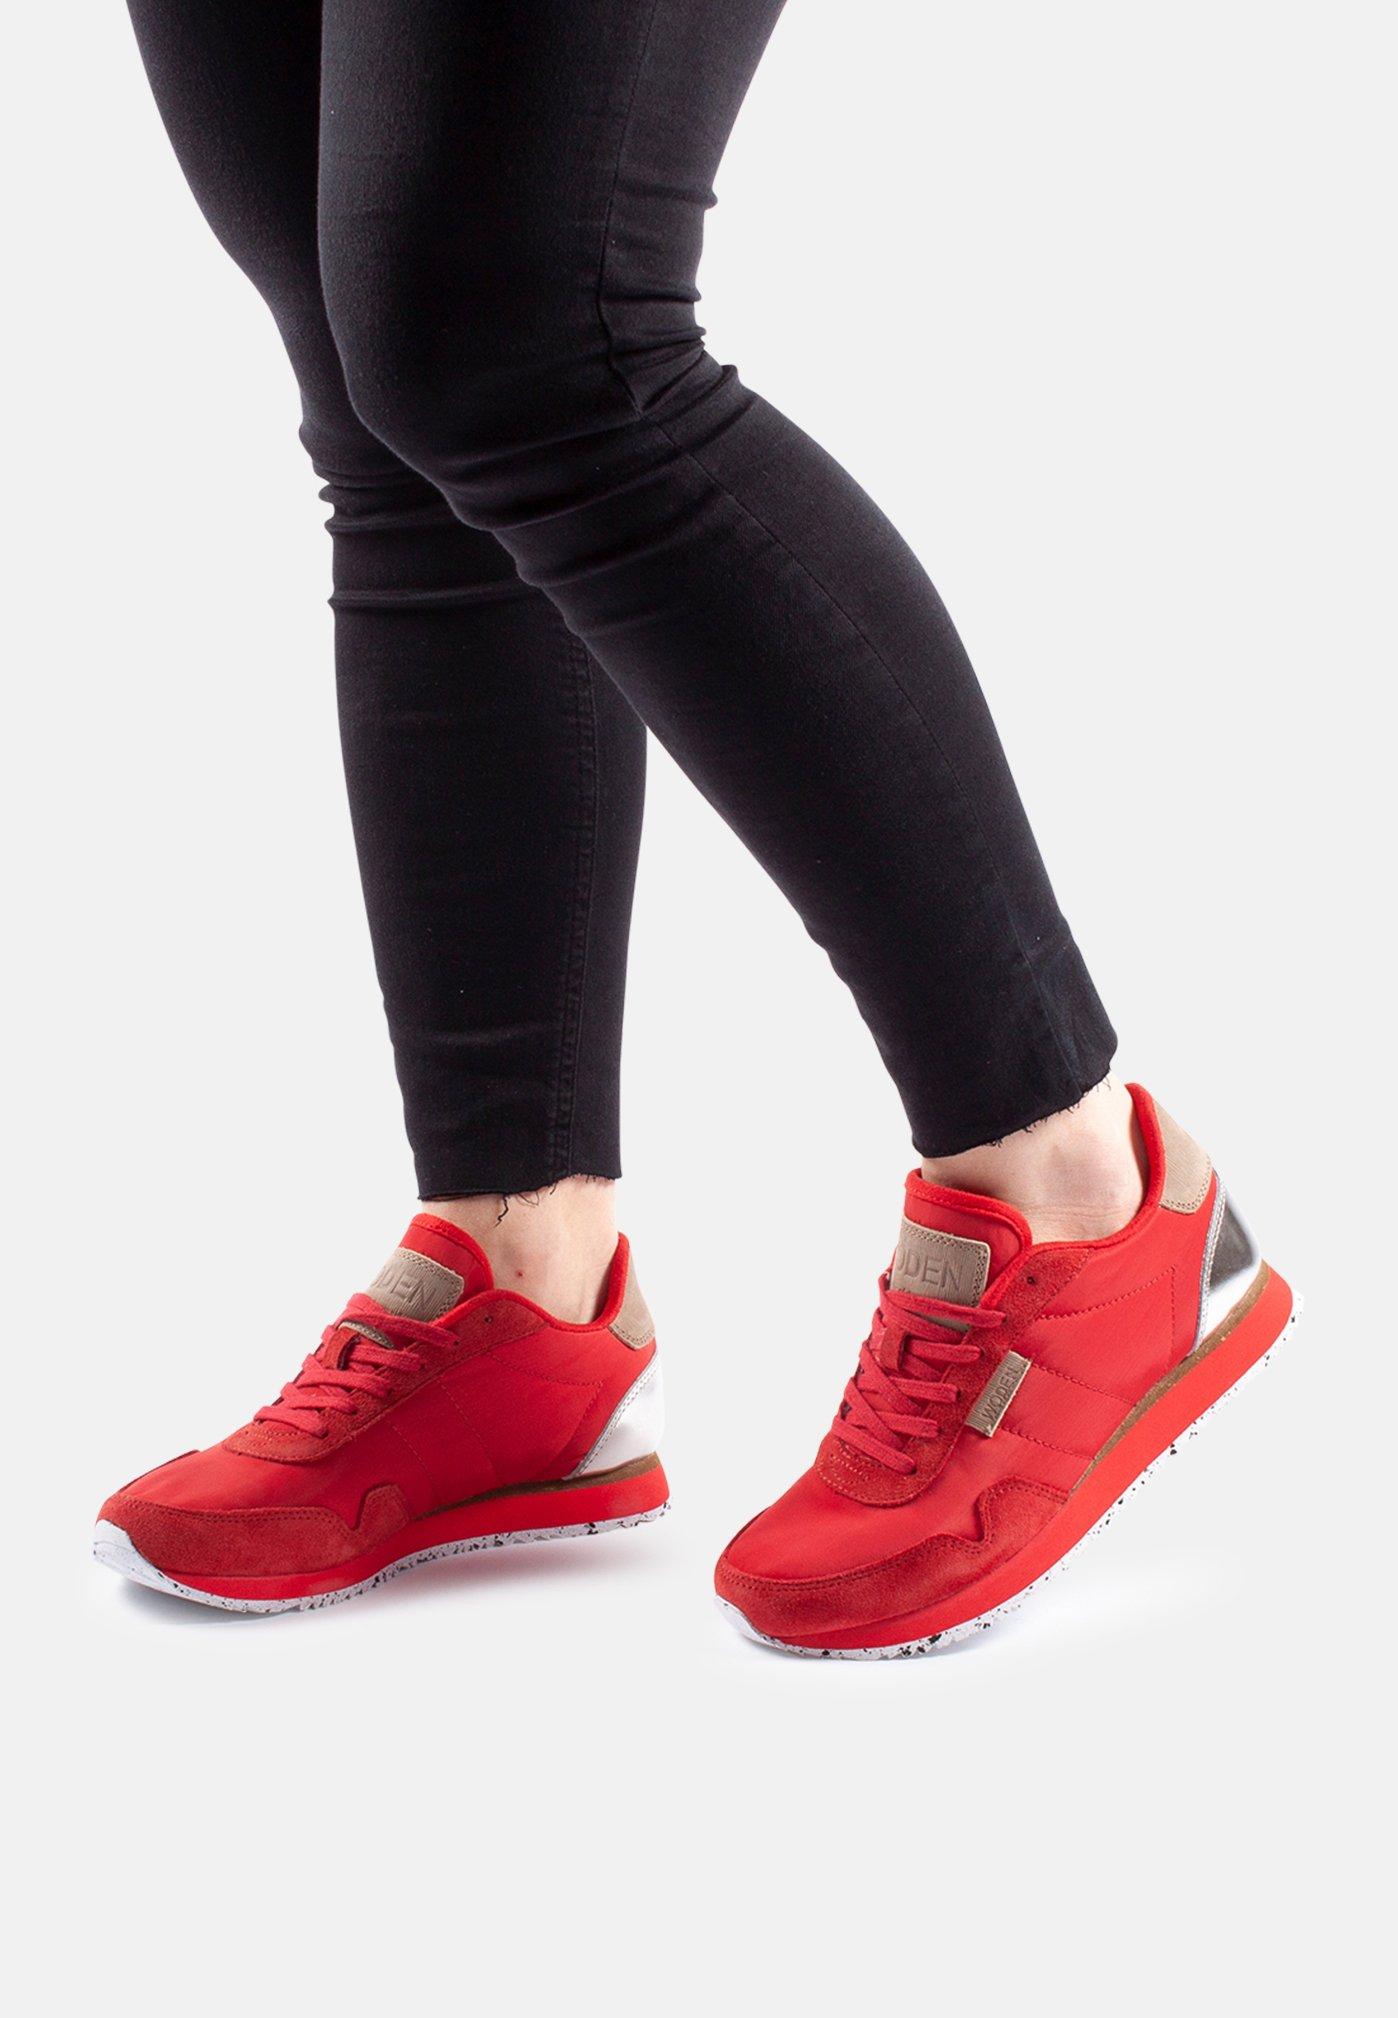 Woden NORA II - Sneaker low - red - Black Friday